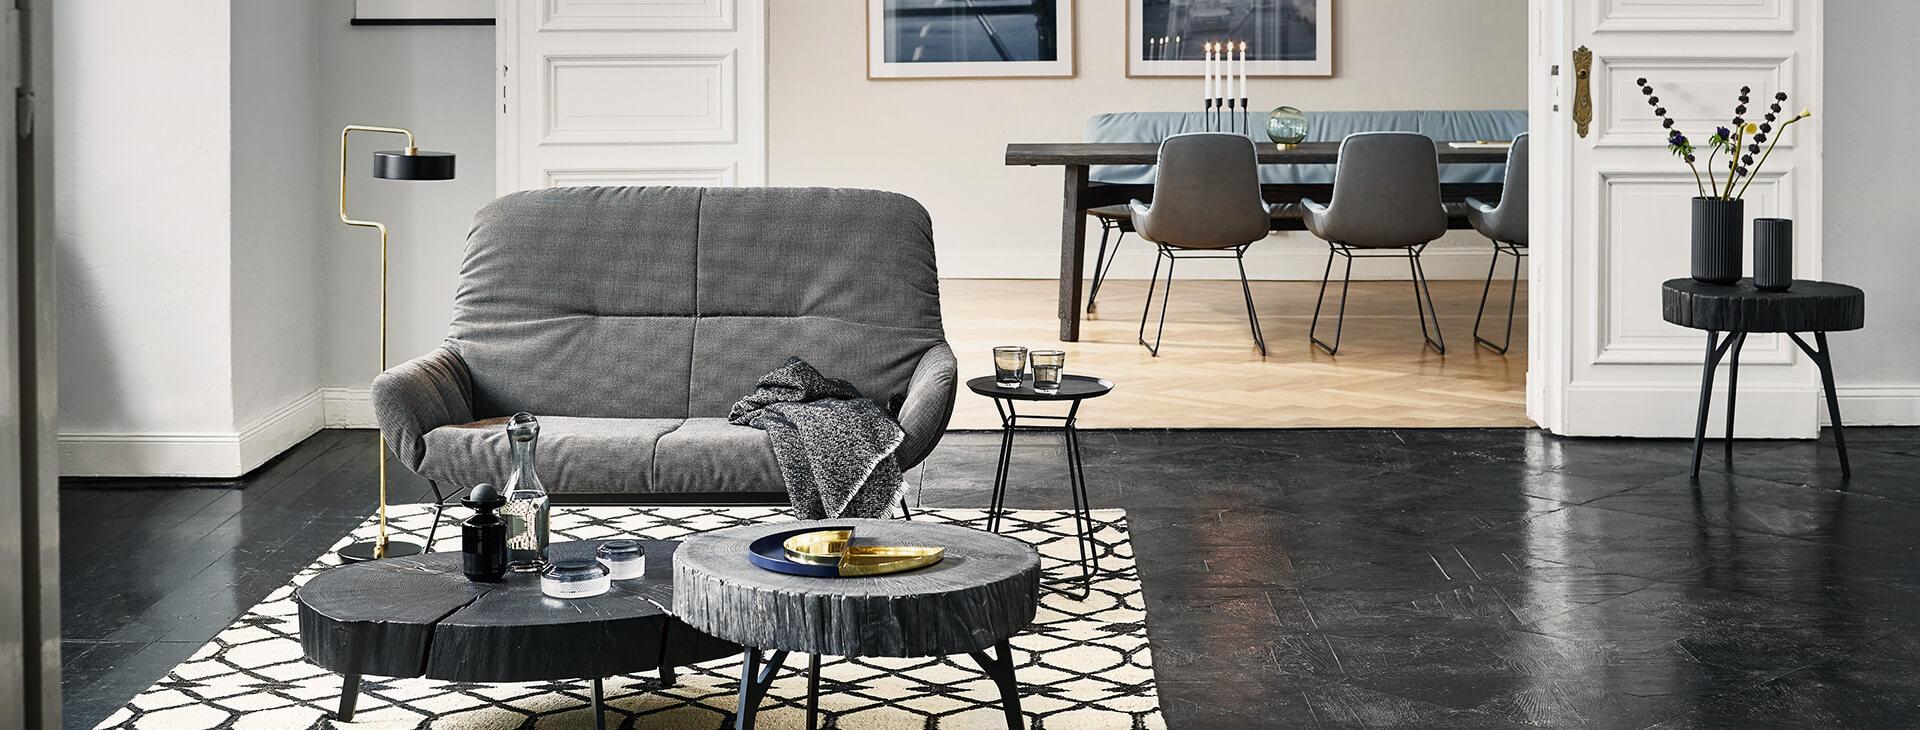 janua freifrau stilwerk news. Black Bedroom Furniture Sets. Home Design Ideas